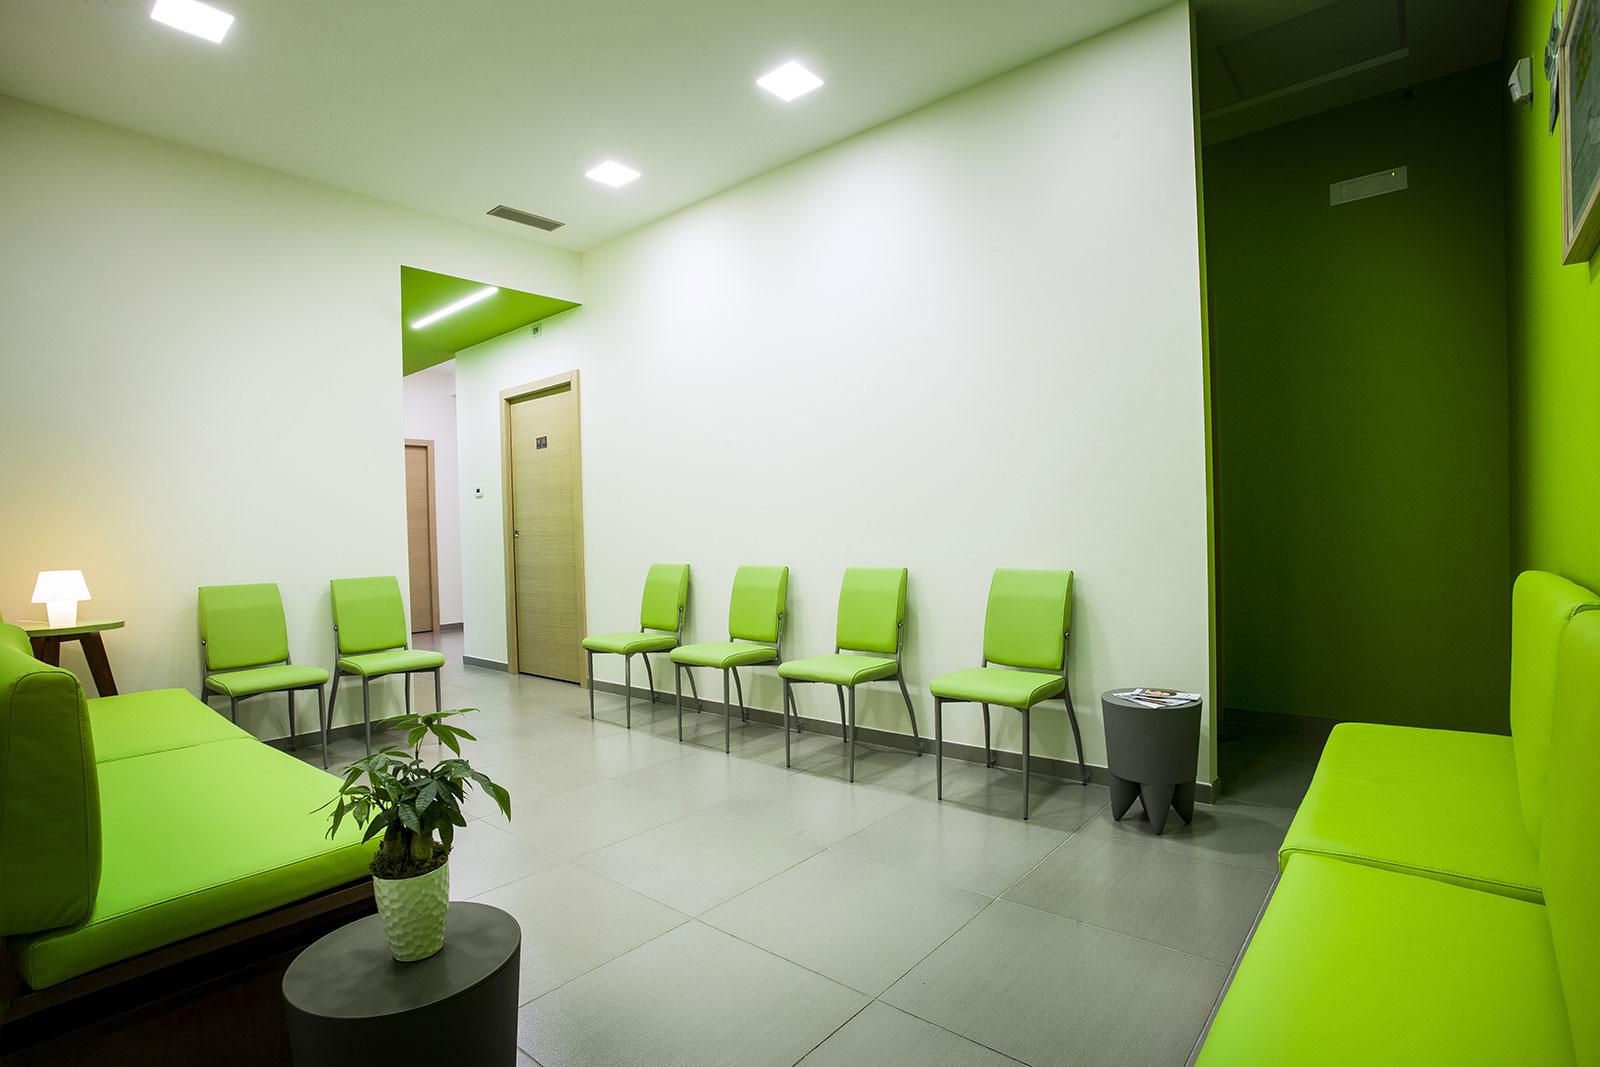 Favorito Sala d'attesa | Novamedica Studio Medico e Odontoiatrico MK38